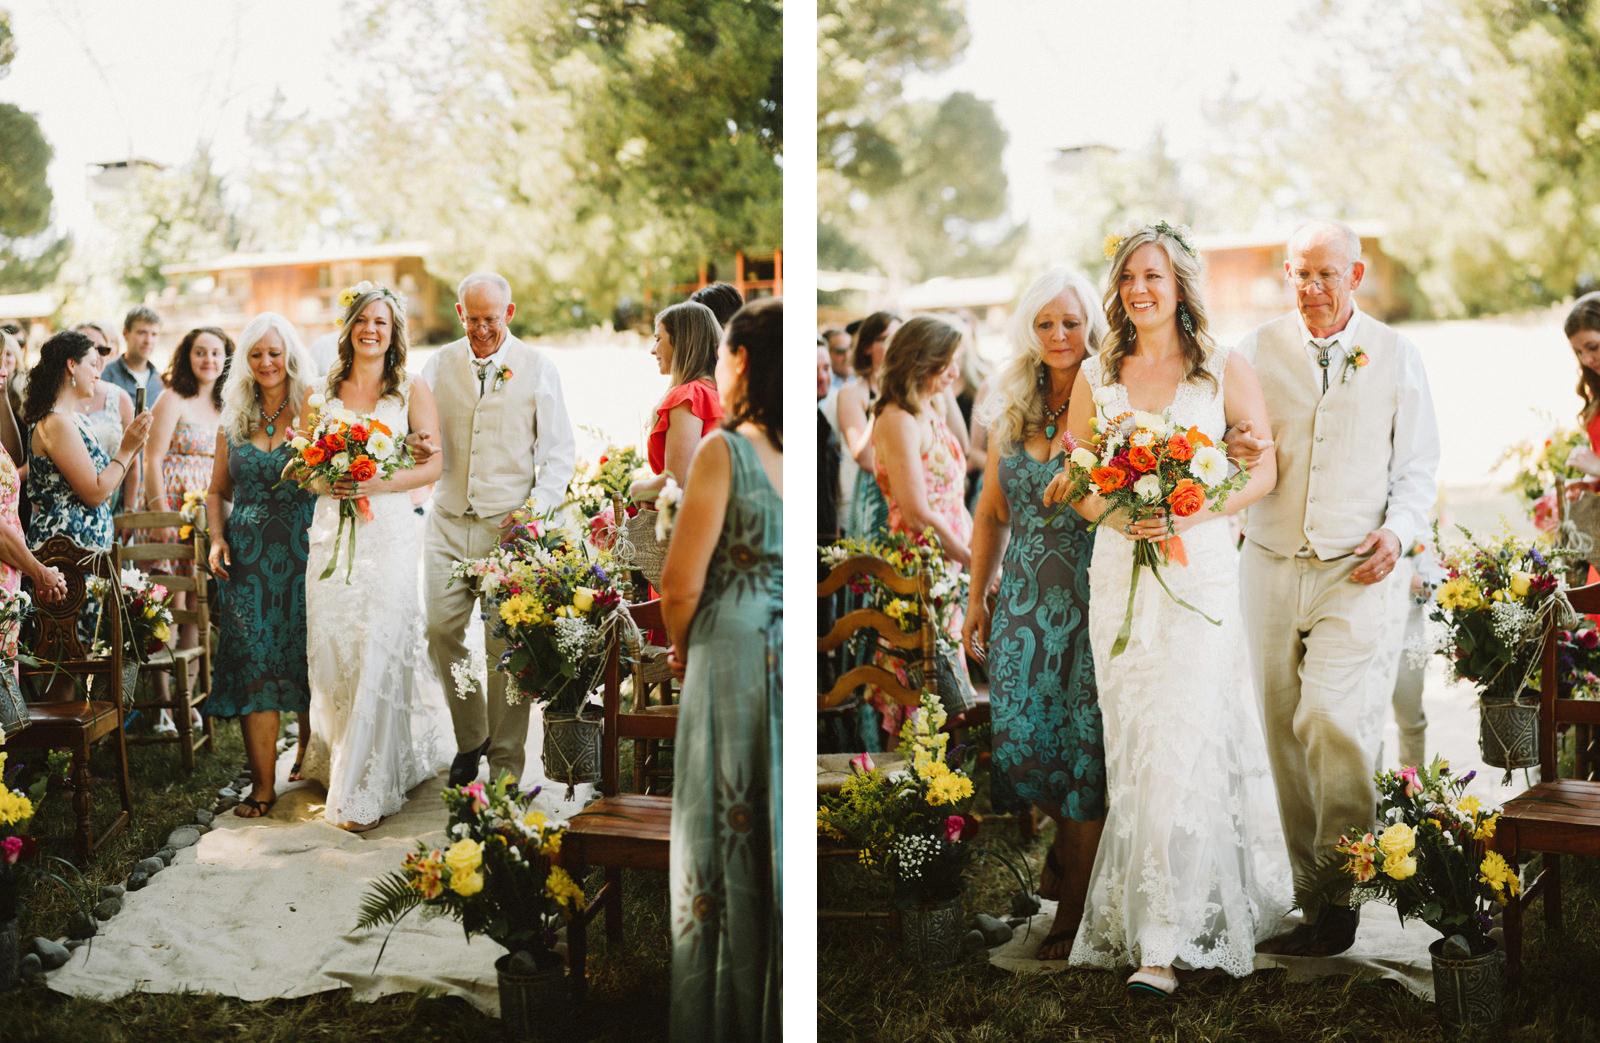 rivers-bend-retreat-wedding-019 RIVER'S BEND RETREAT WEDDING